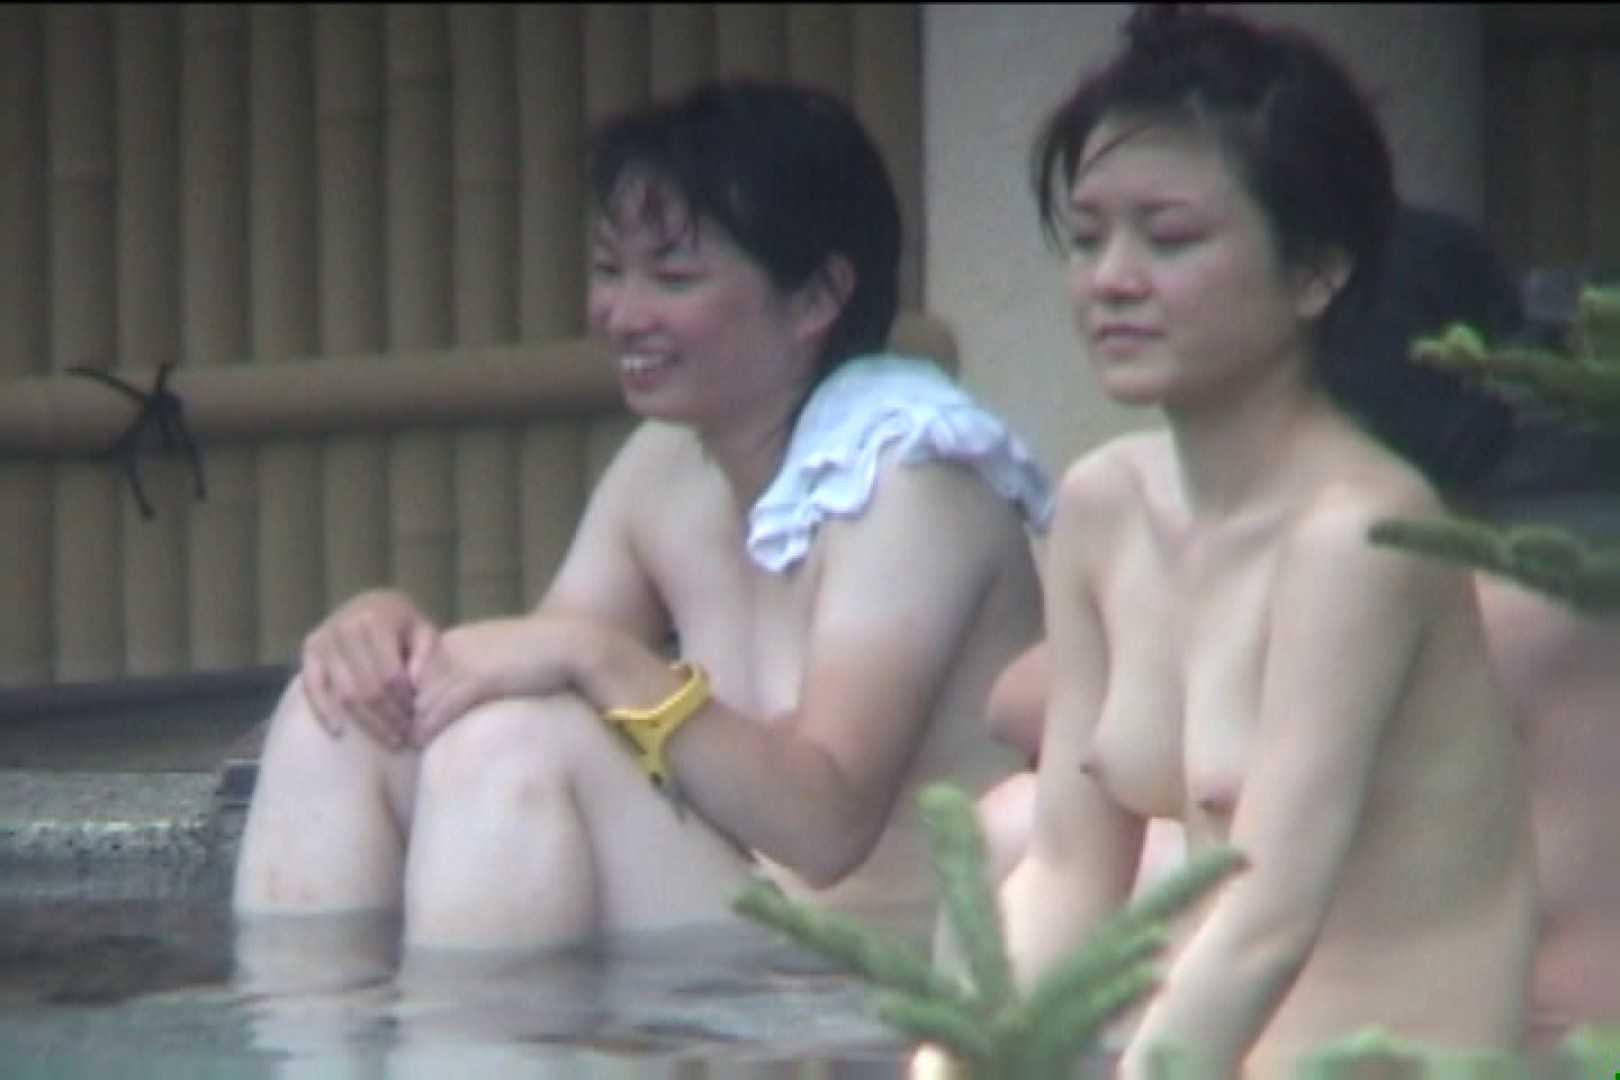 Aquaな露天風呂Vol.94【VIP限定】 盗撮 性交動画流出 20連発 2